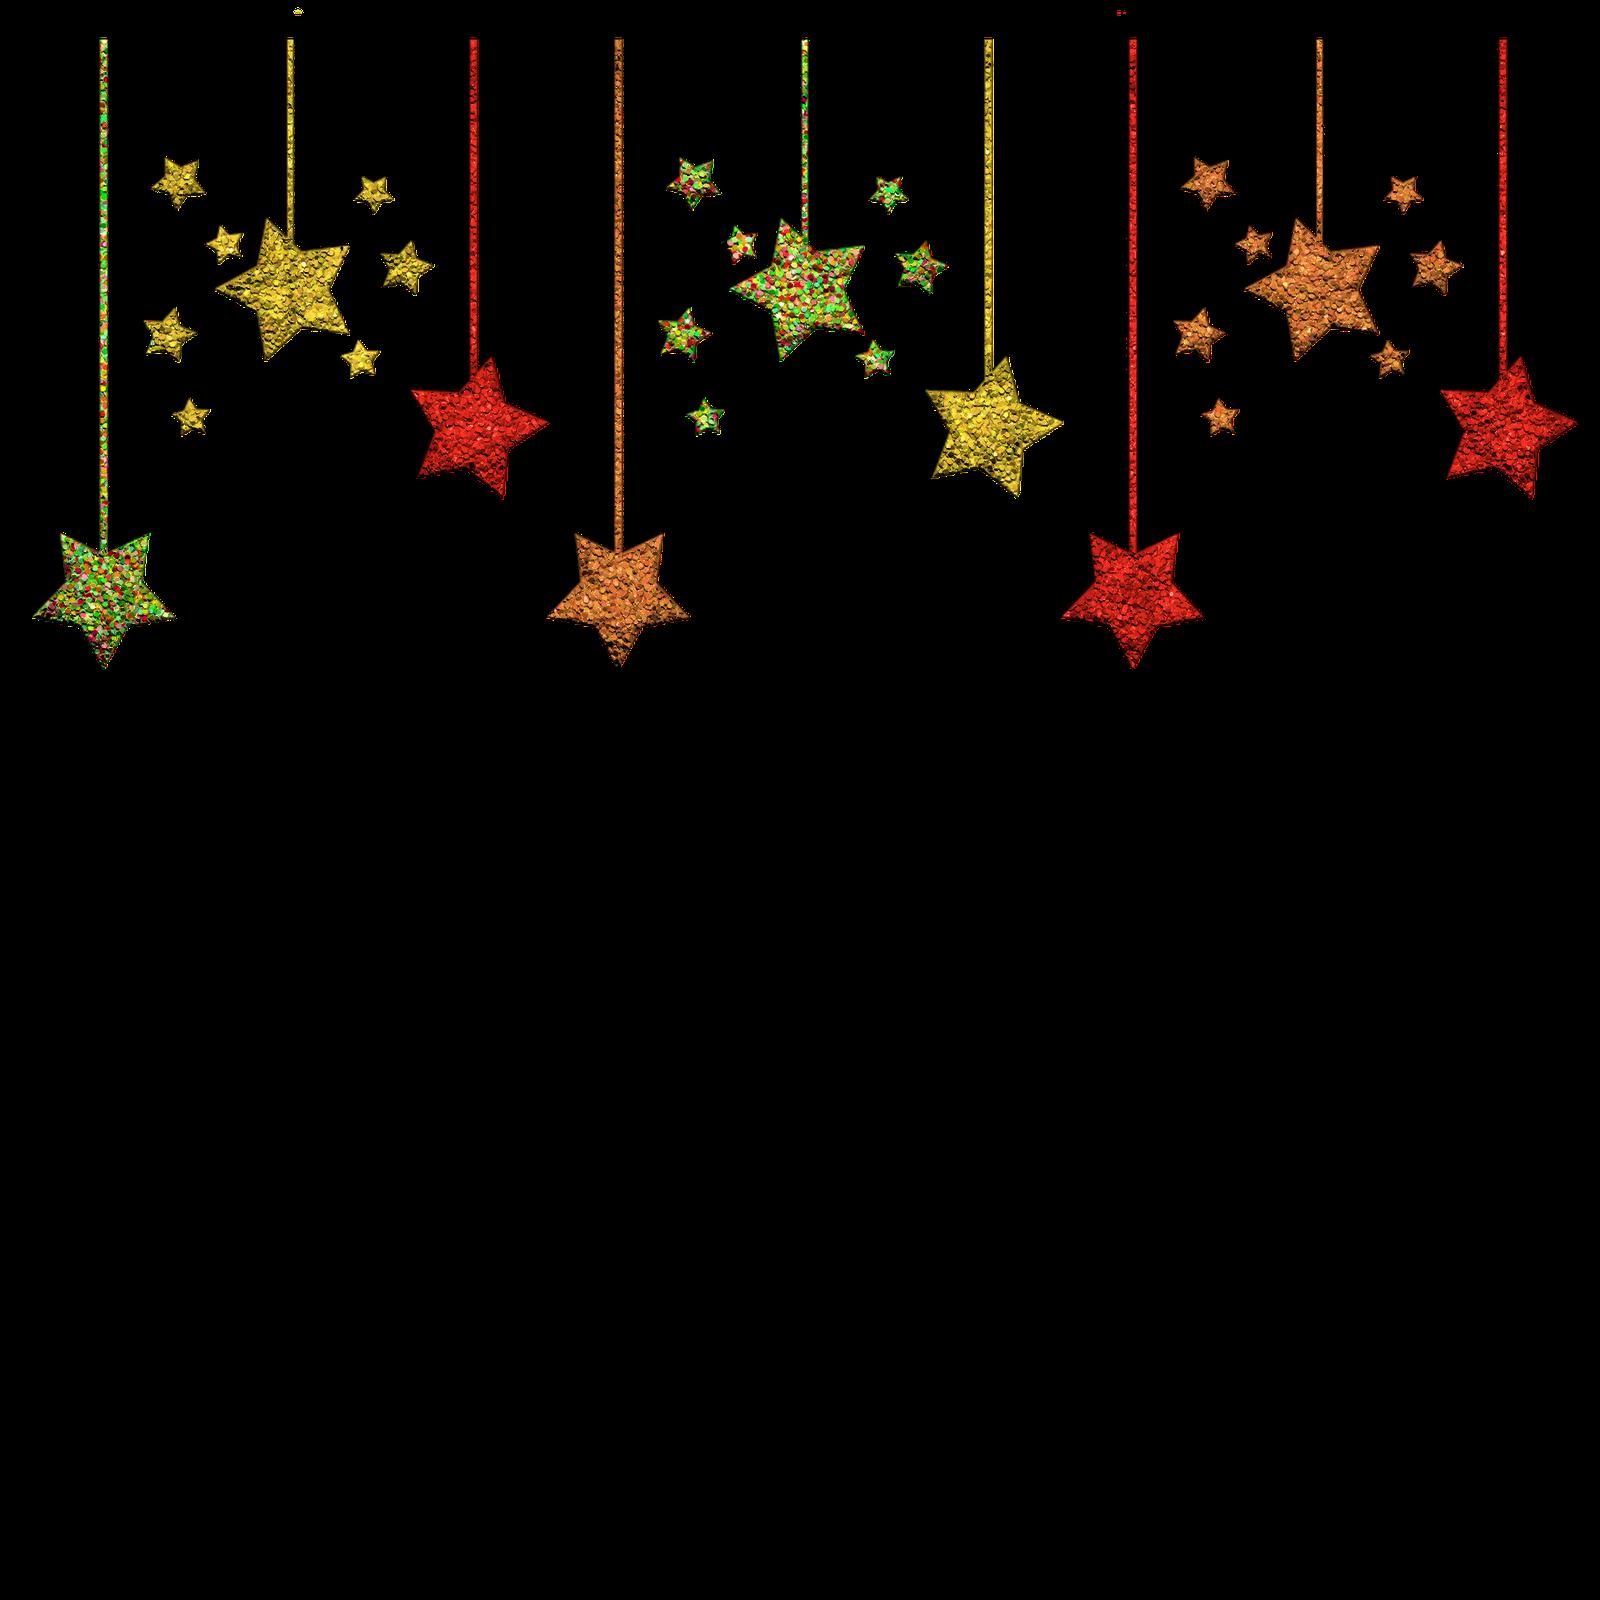 marcos navideños para editar